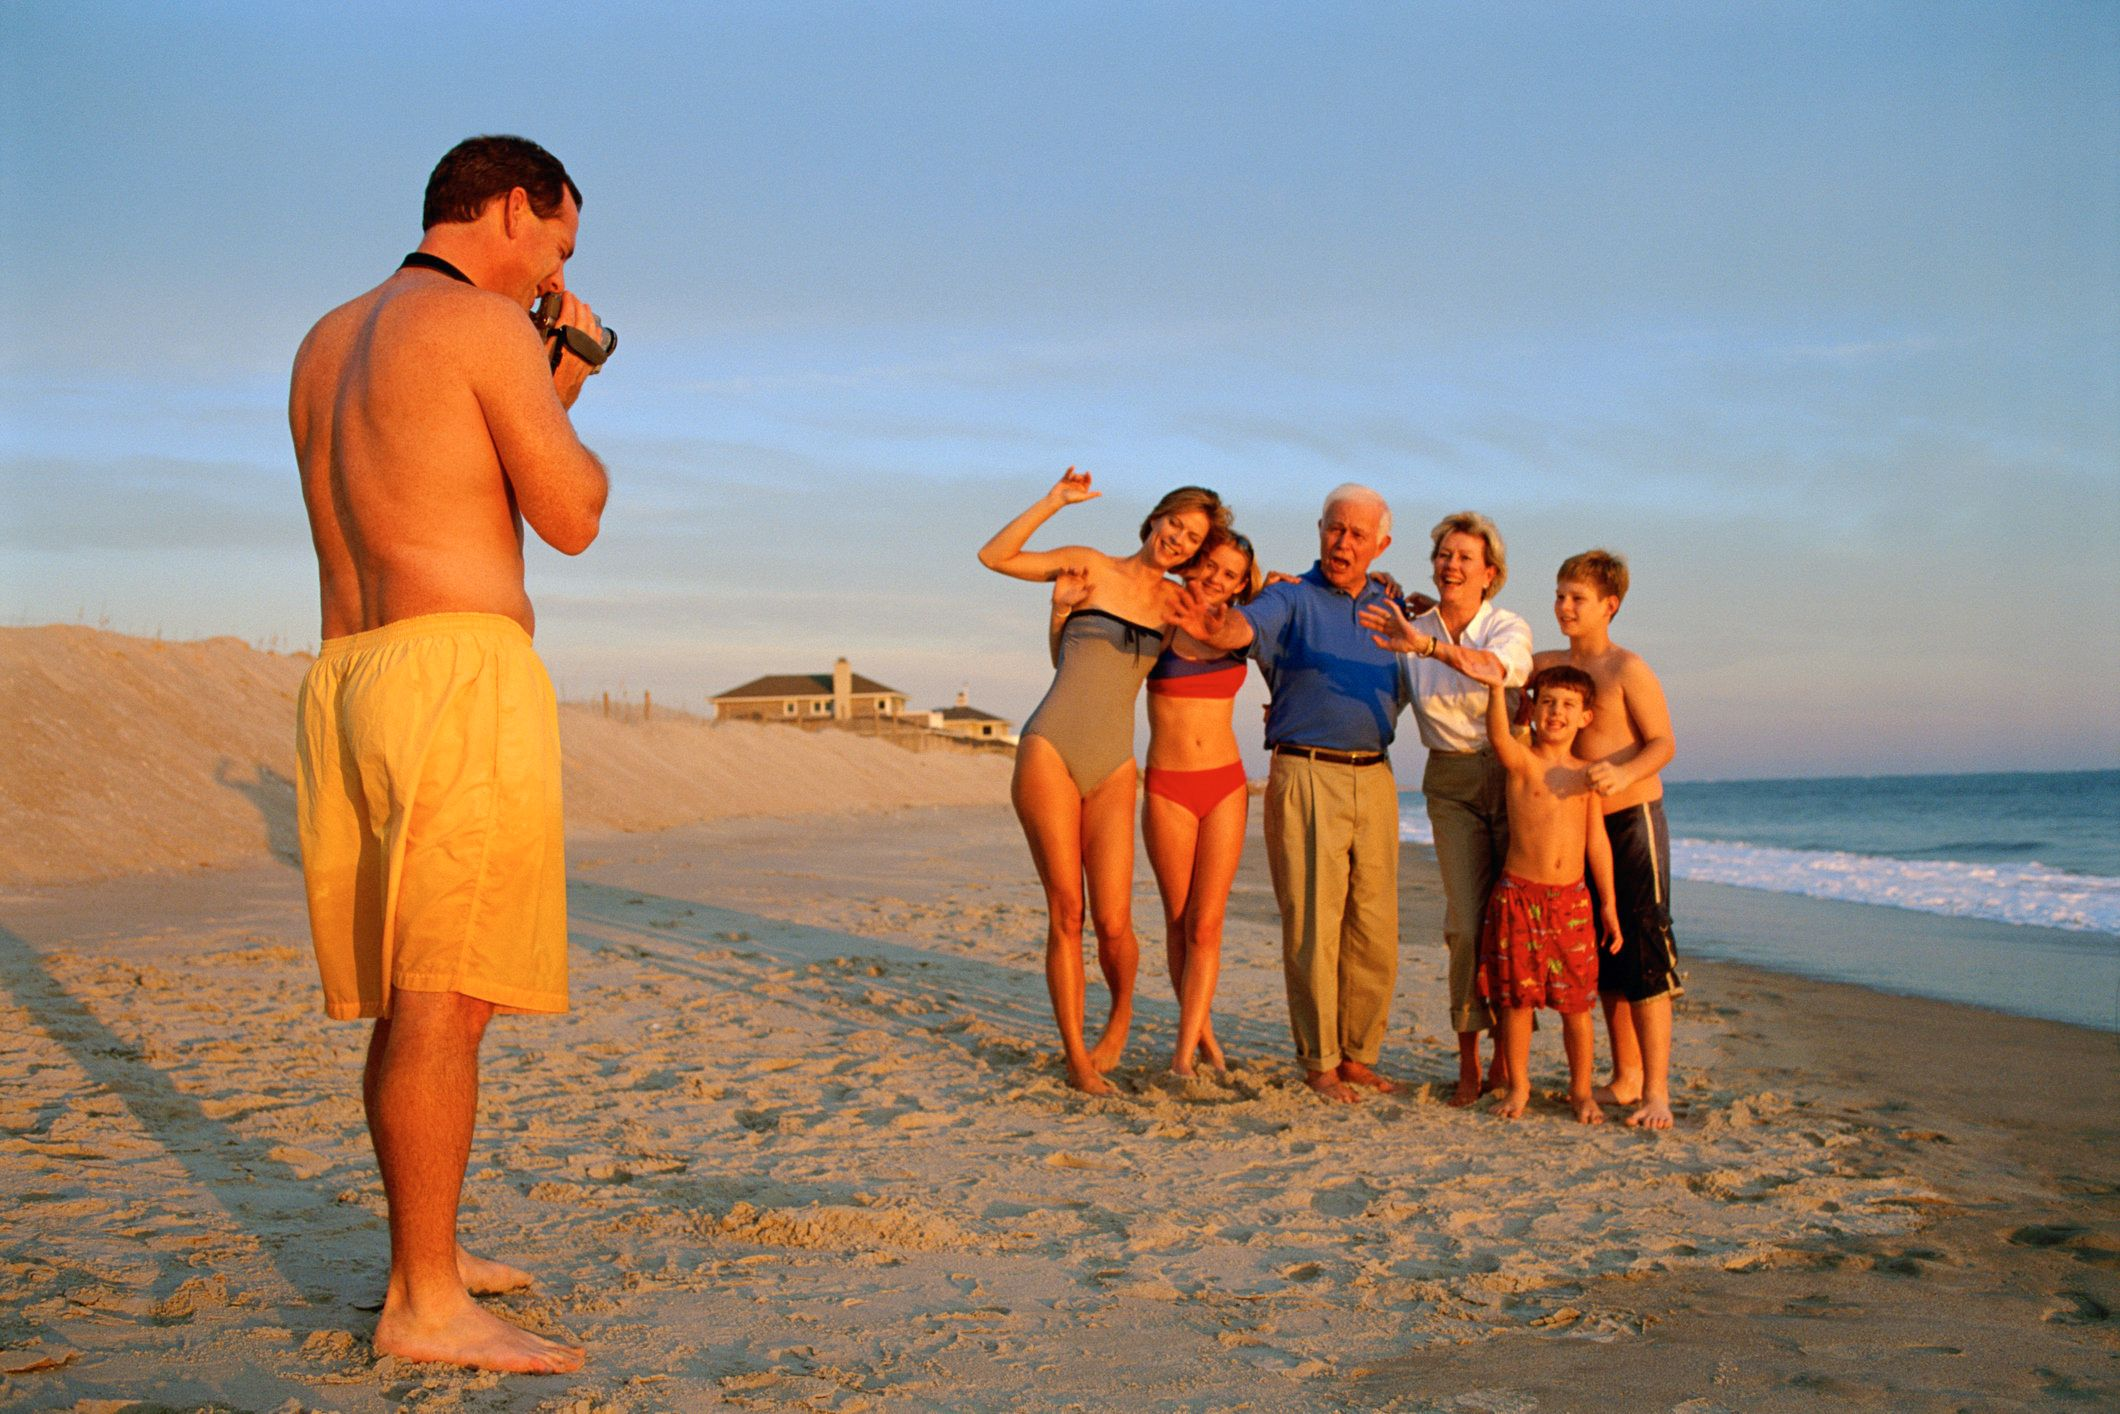 Man videotaping family on beach